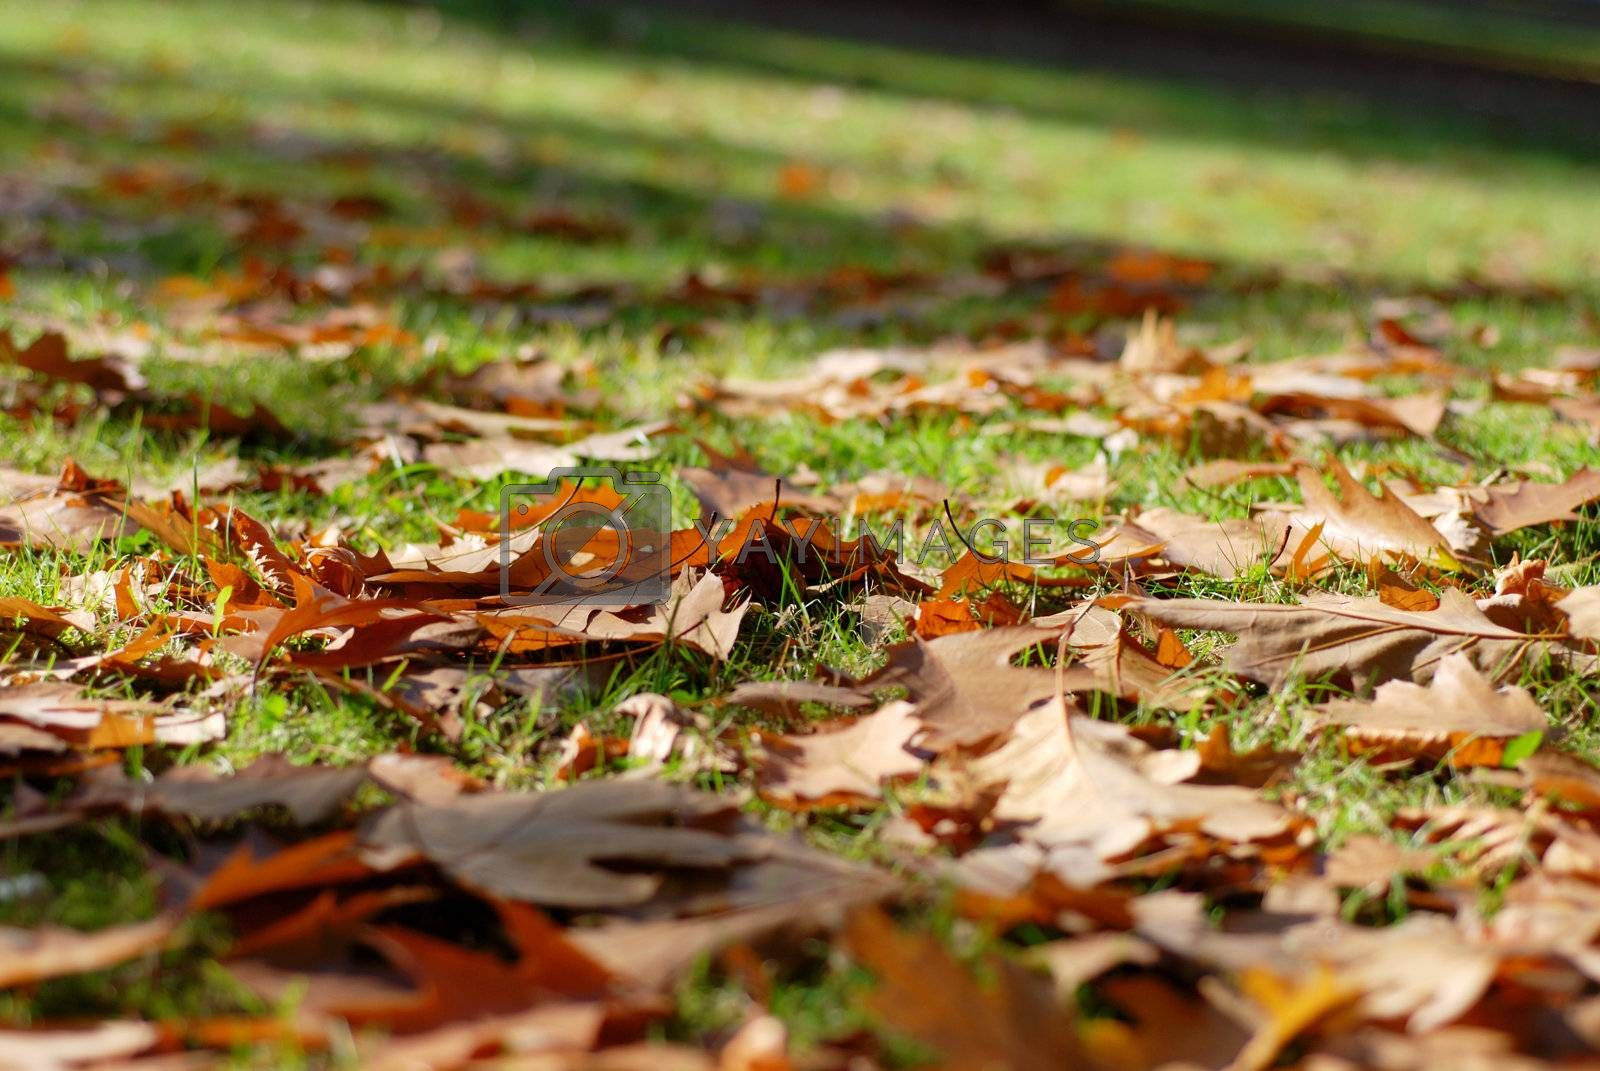 Royalty free image of Leaves of oak scattered on the grass. Autumn season. by wojciechkozlowski